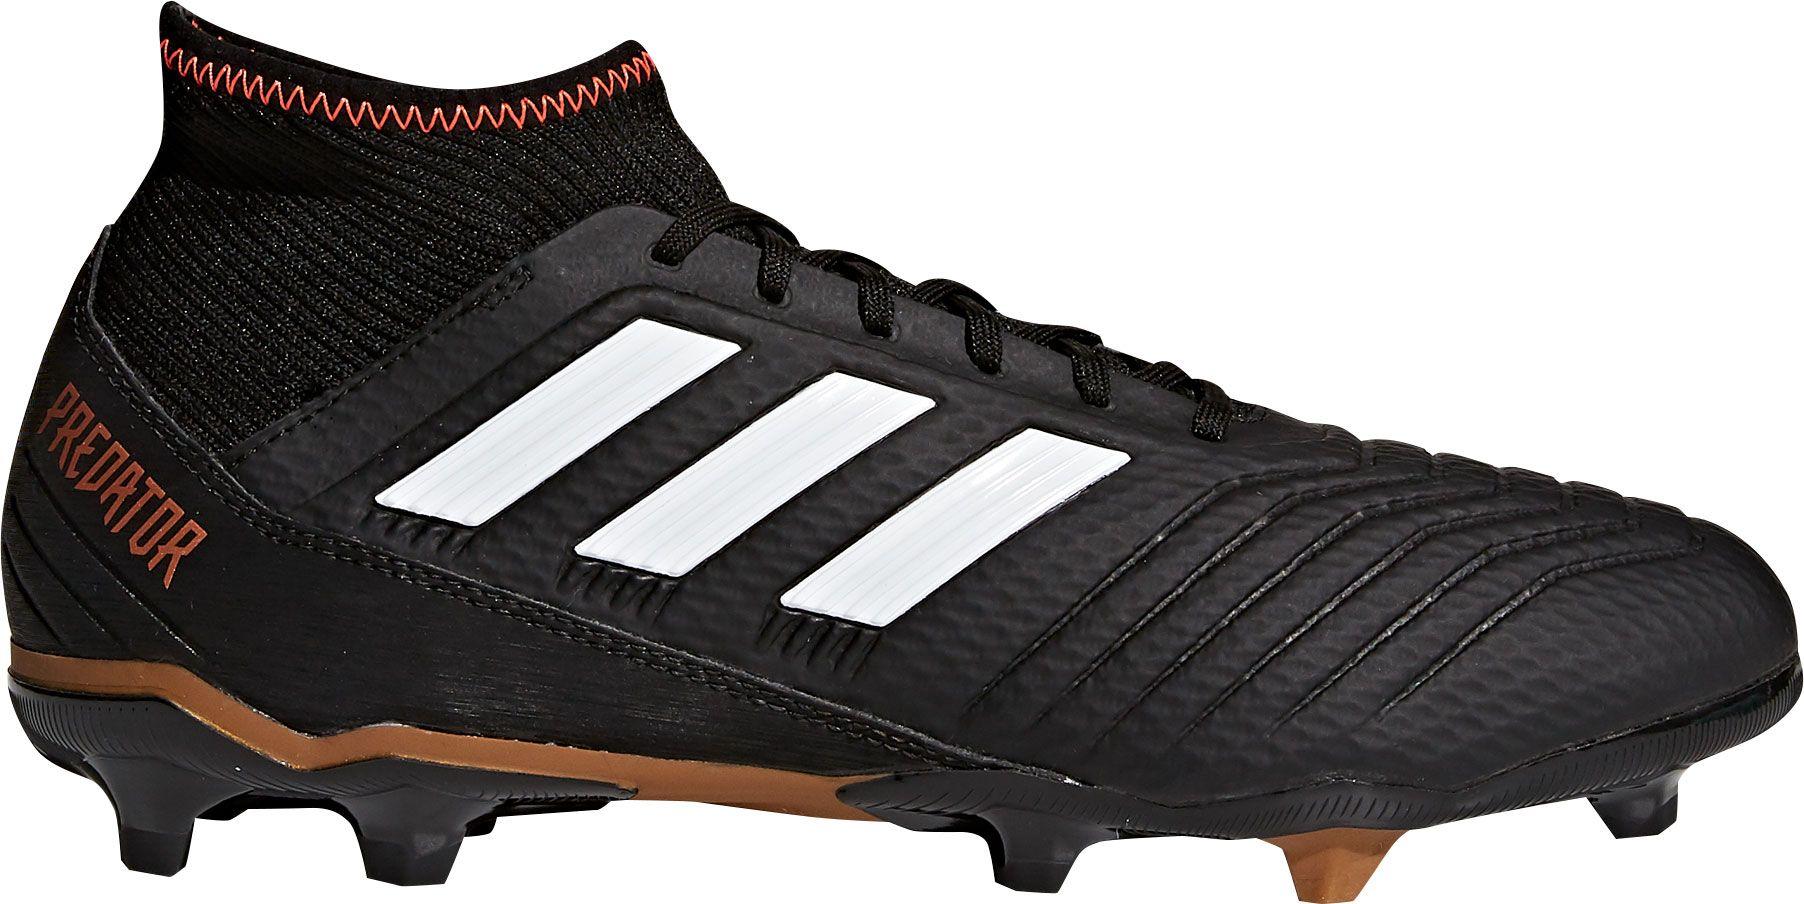 c9bc11be1ae2 ... adidas Mens Predator 18.3 FG Soccer Cleats DICKS Sporting ...